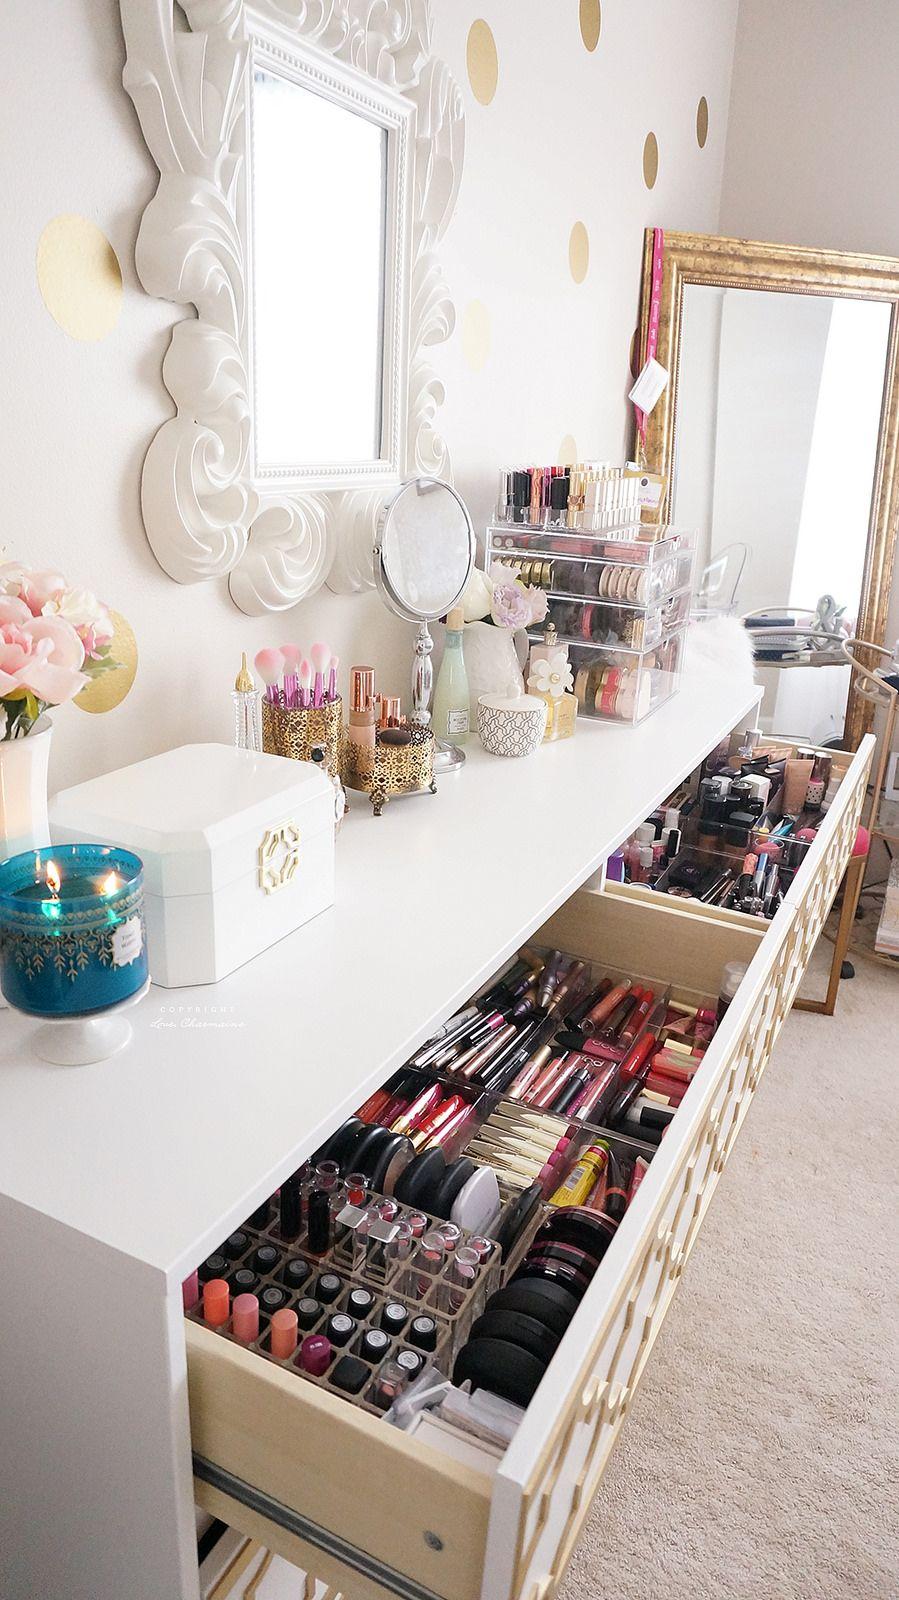 Biascardoso makeup eyes pinterest makeup collection storage